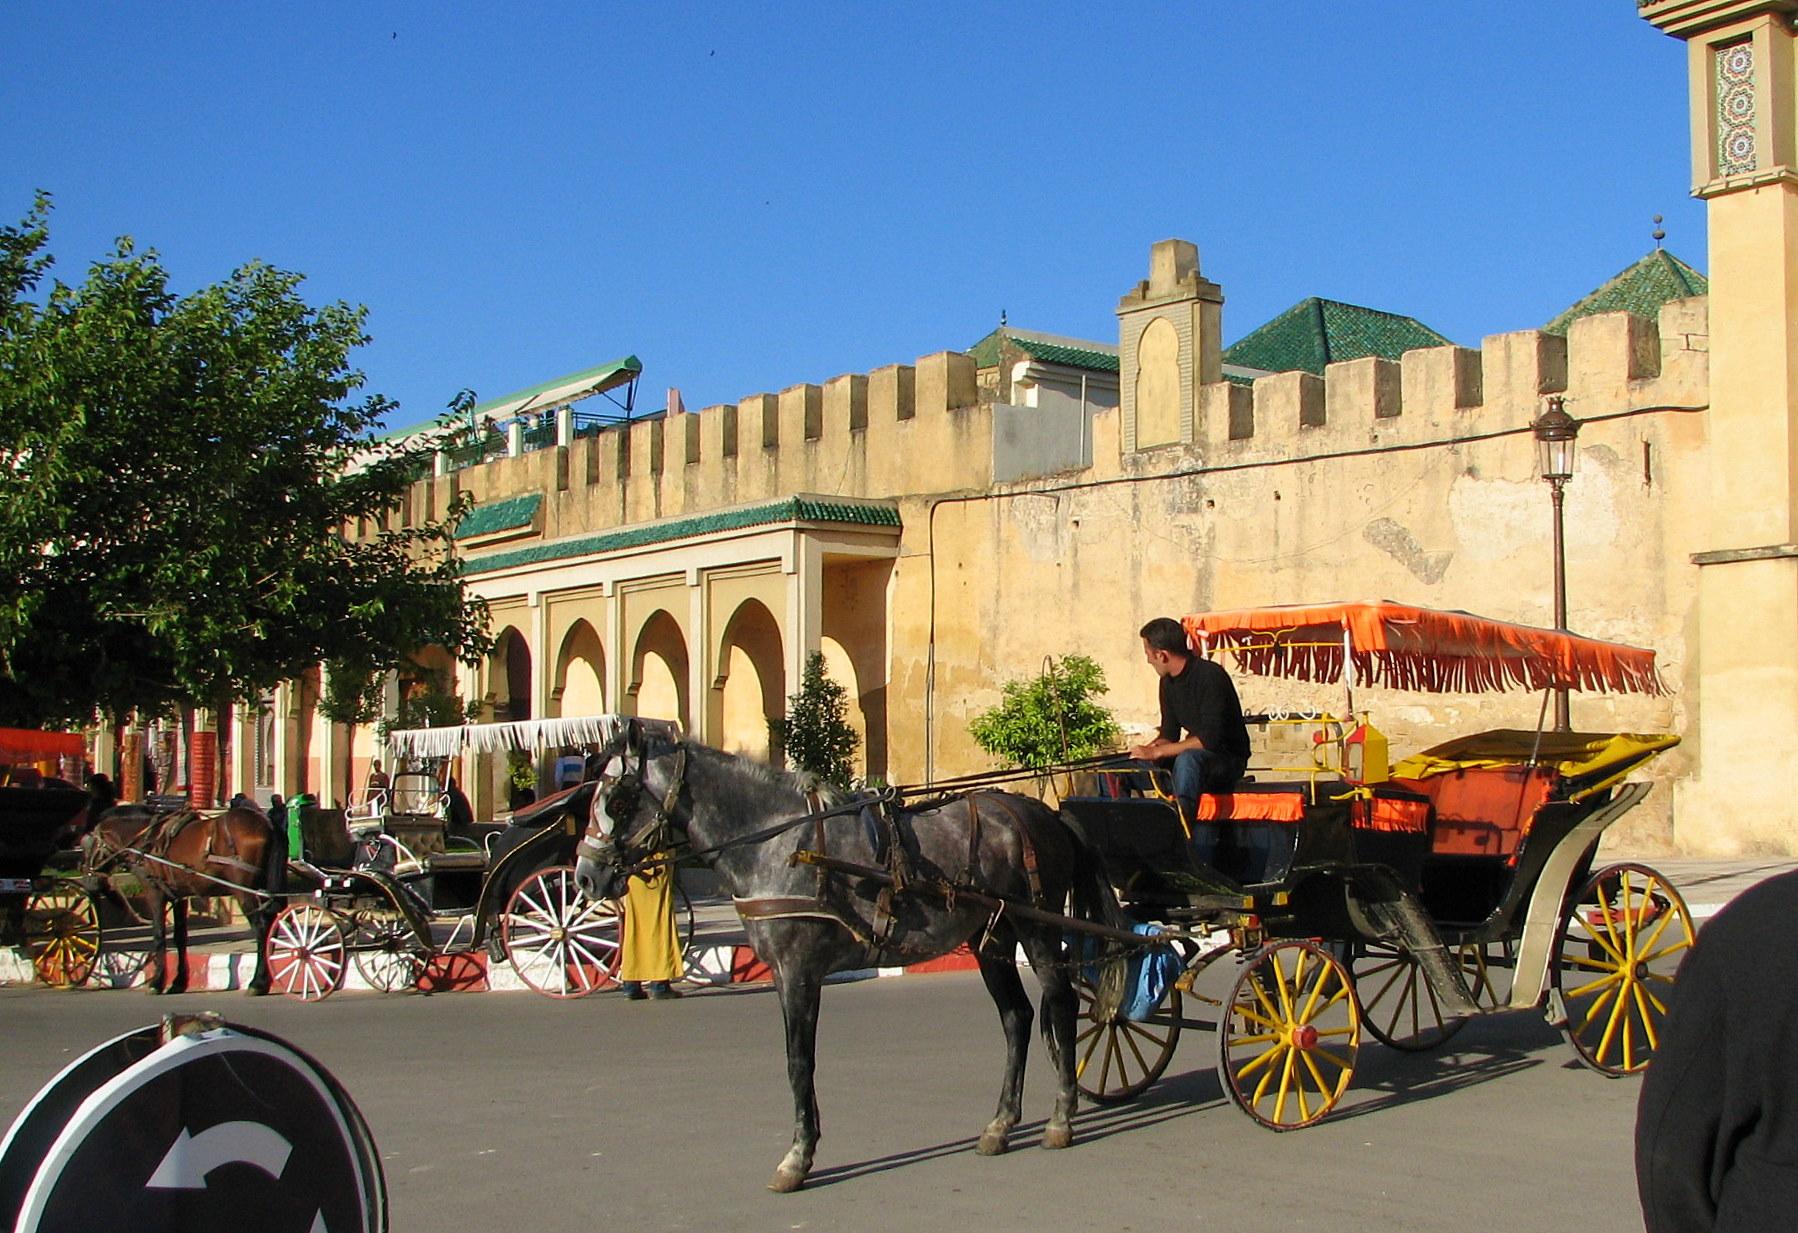 The Top 10 Things to Do Near Jardin Majorelle Marrakech TripAdvisor